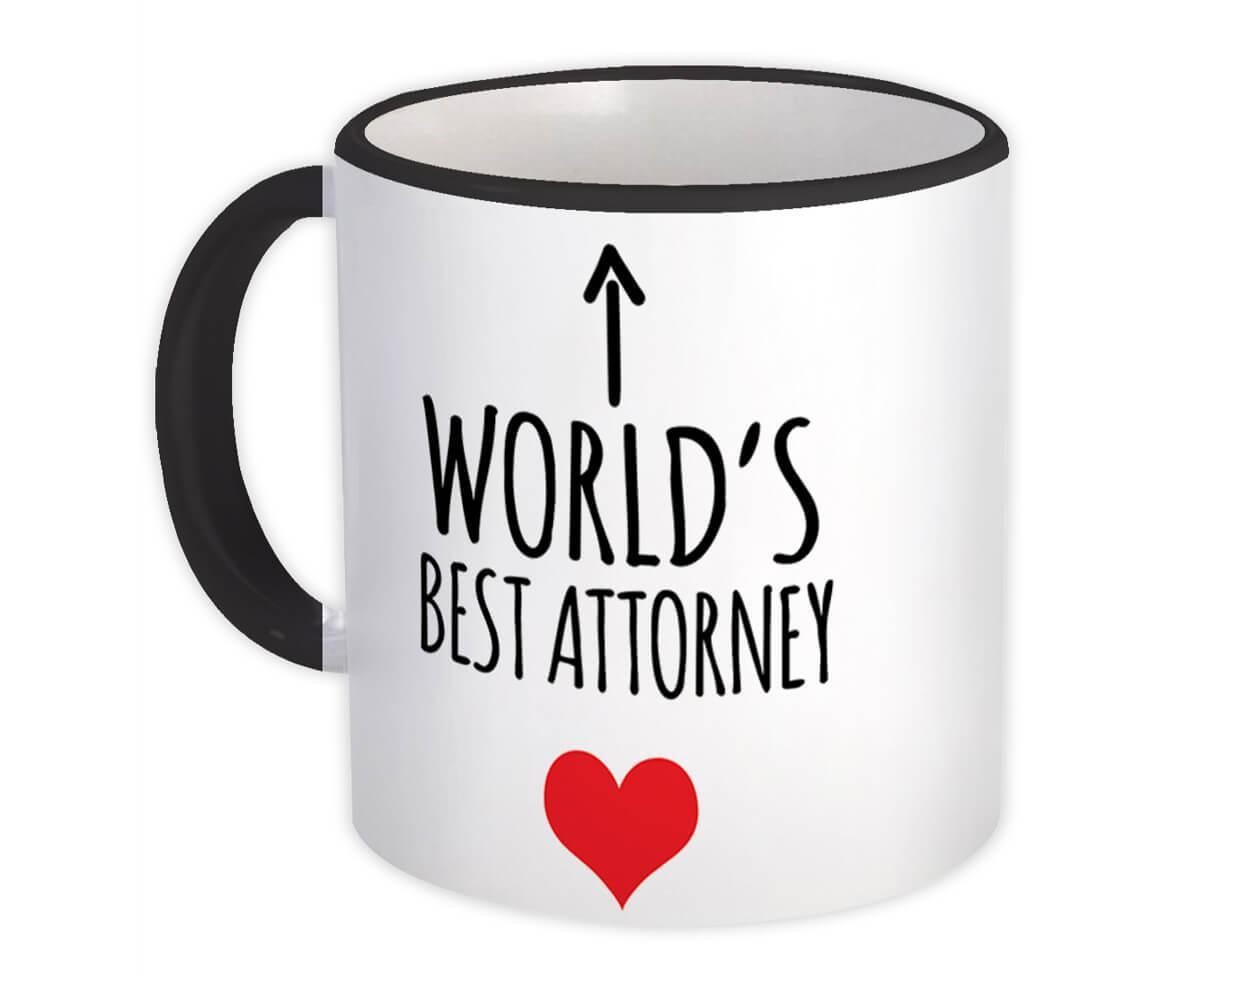 Worlds Best ATTORNEY : Gift Mug Heart Love Family Work Christmas Birthday